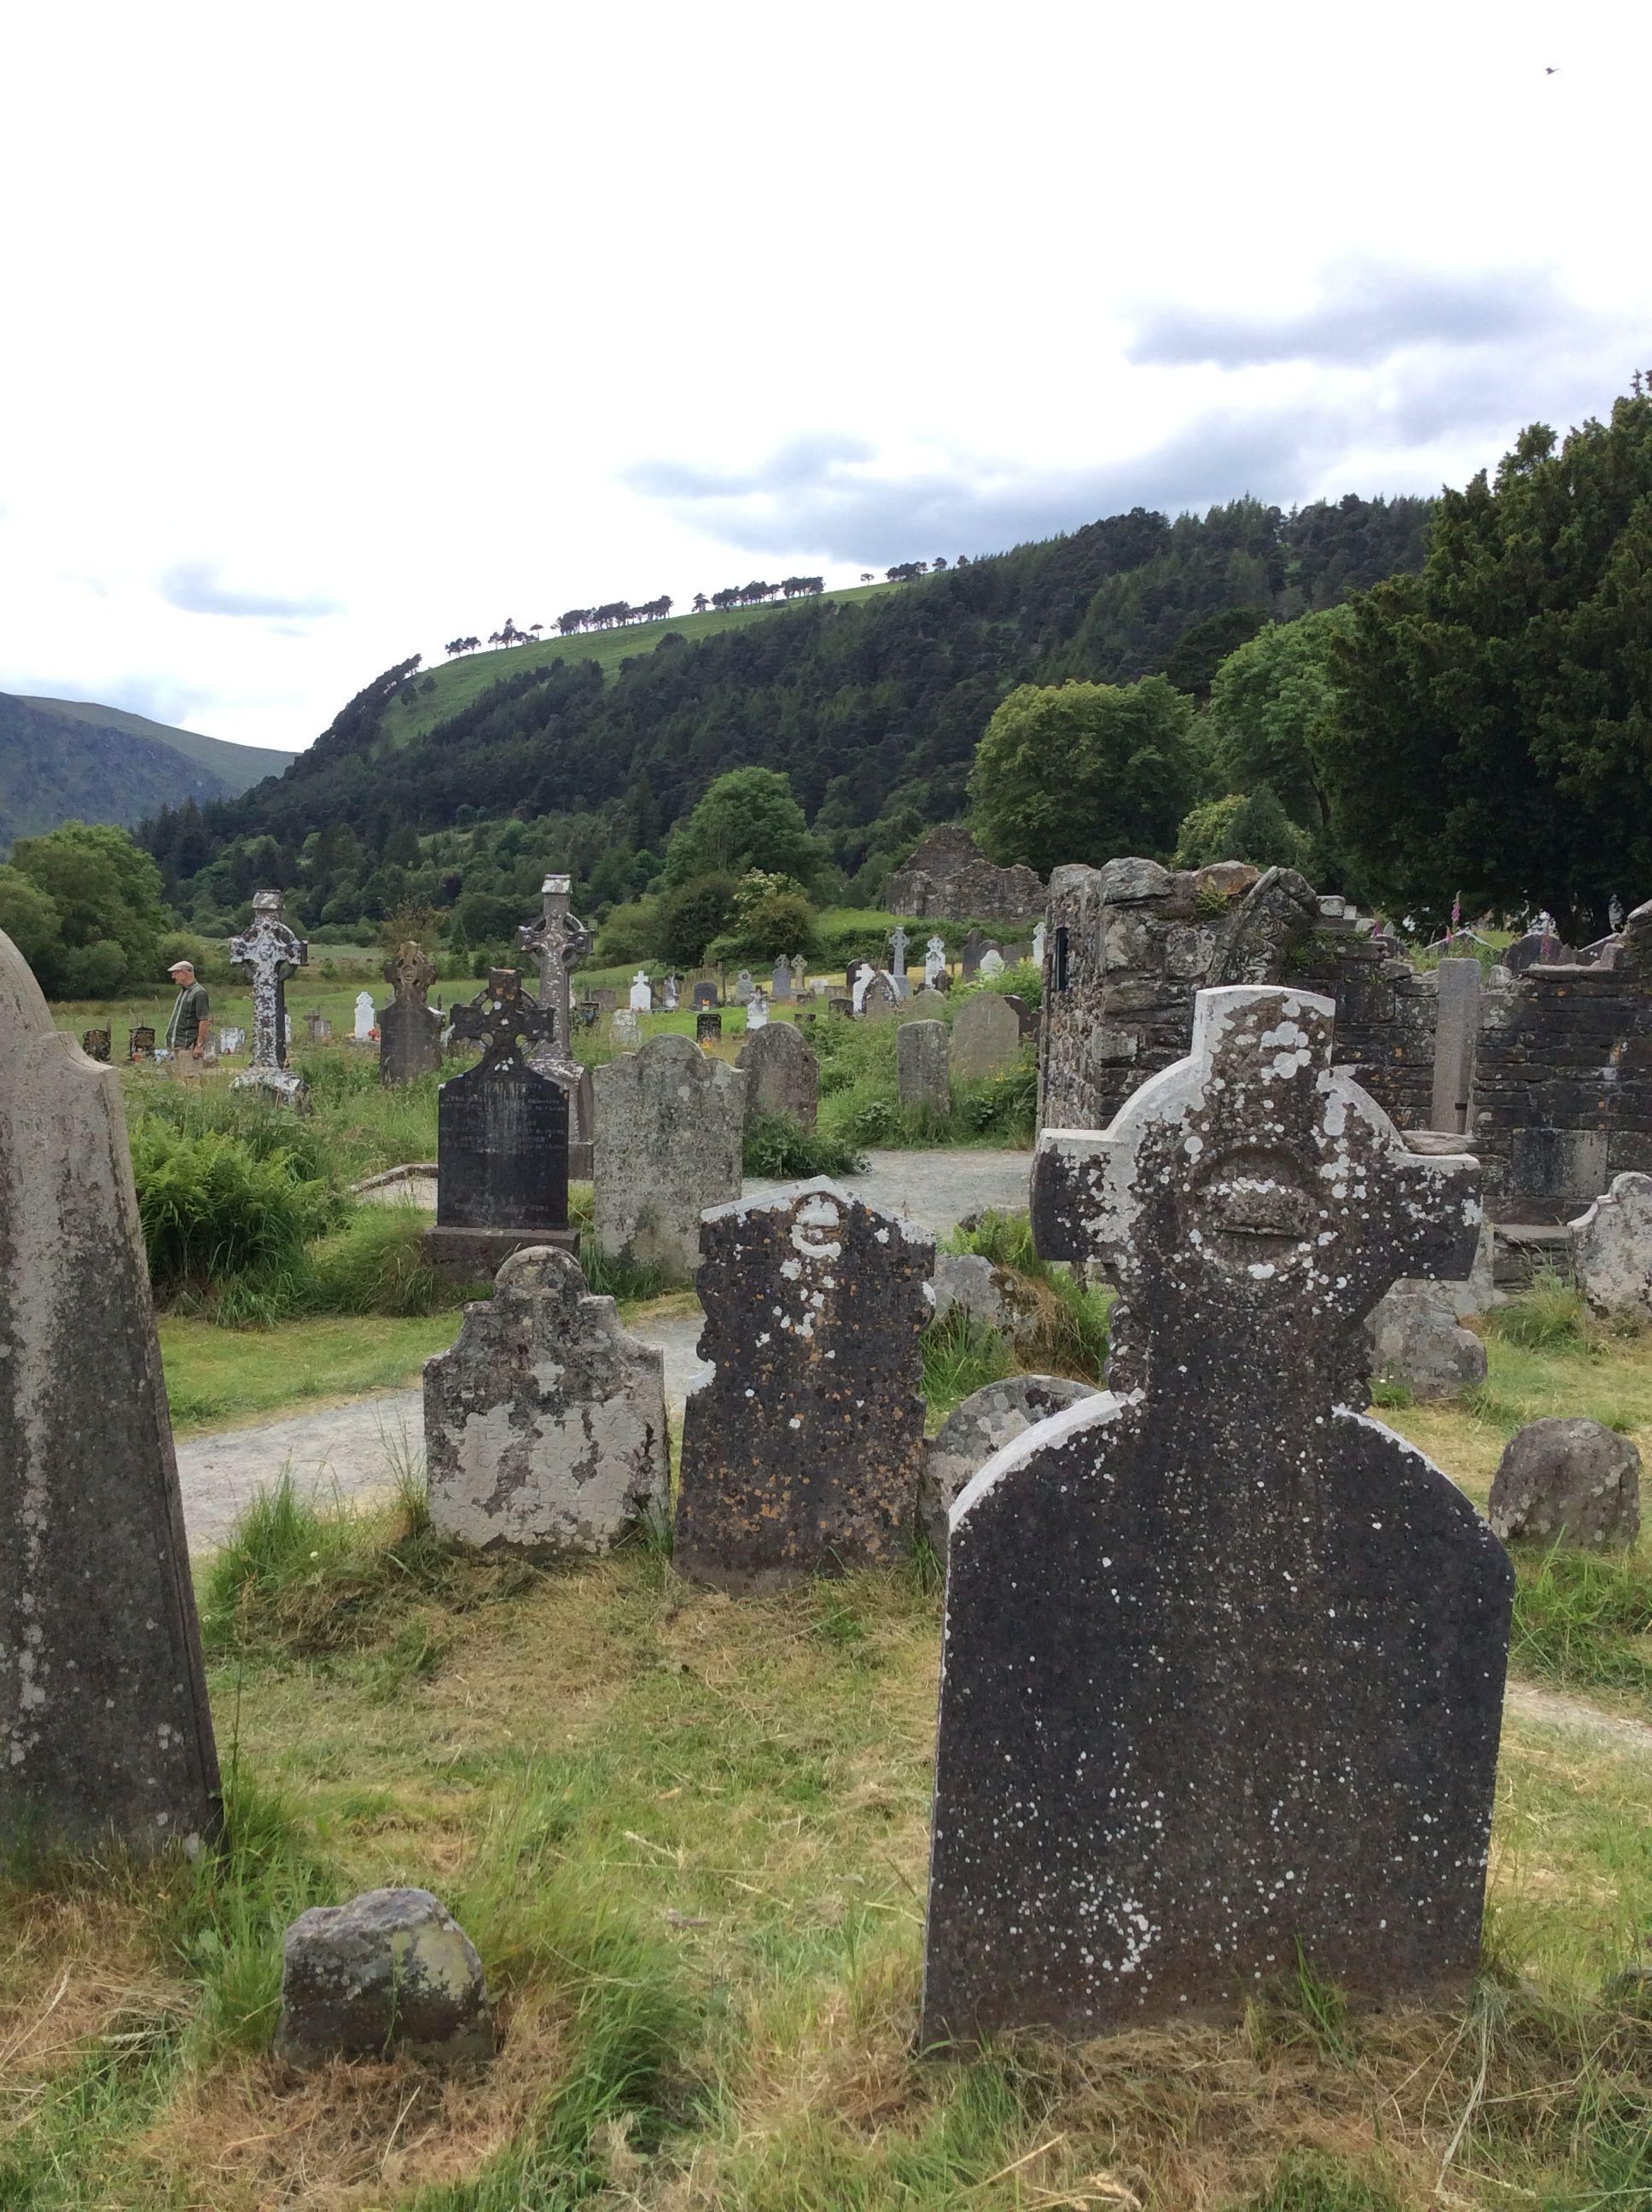 Celtic cemetary at Glendalough.